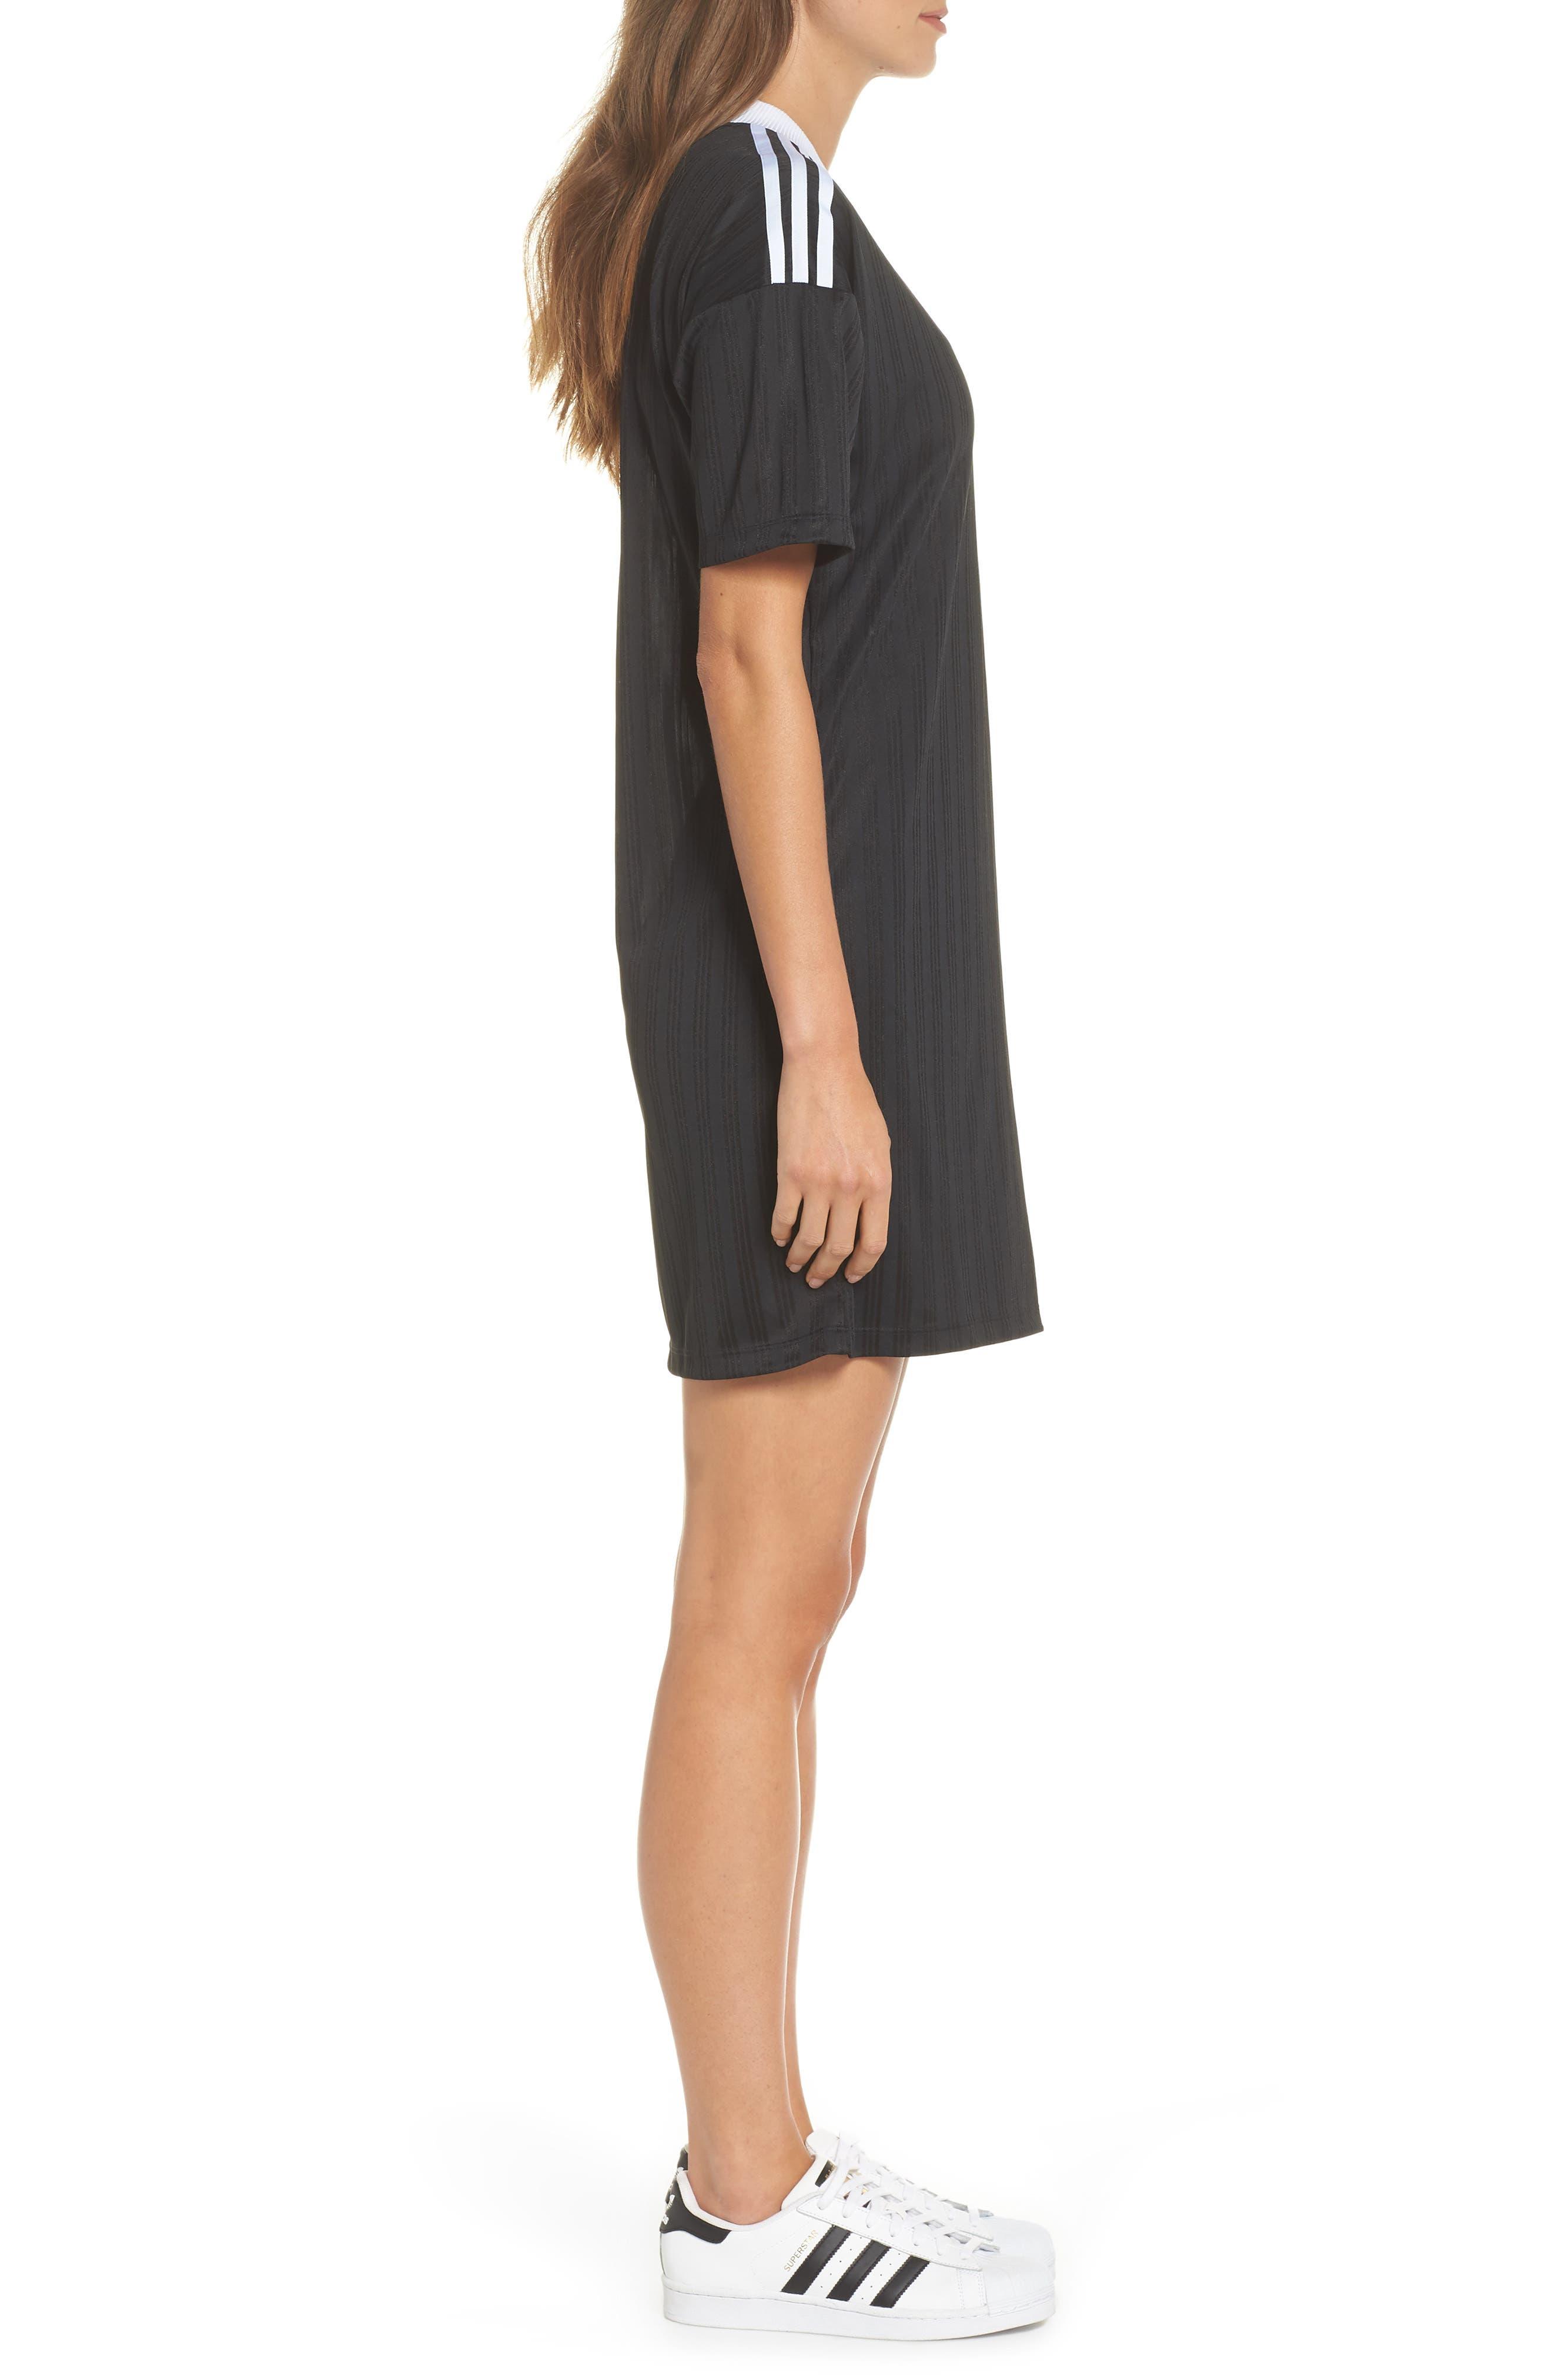 ADIDAS ORIGINALS,                             Trefoil T-Shirt Dress,                             Alternate thumbnail 3, color,                             001